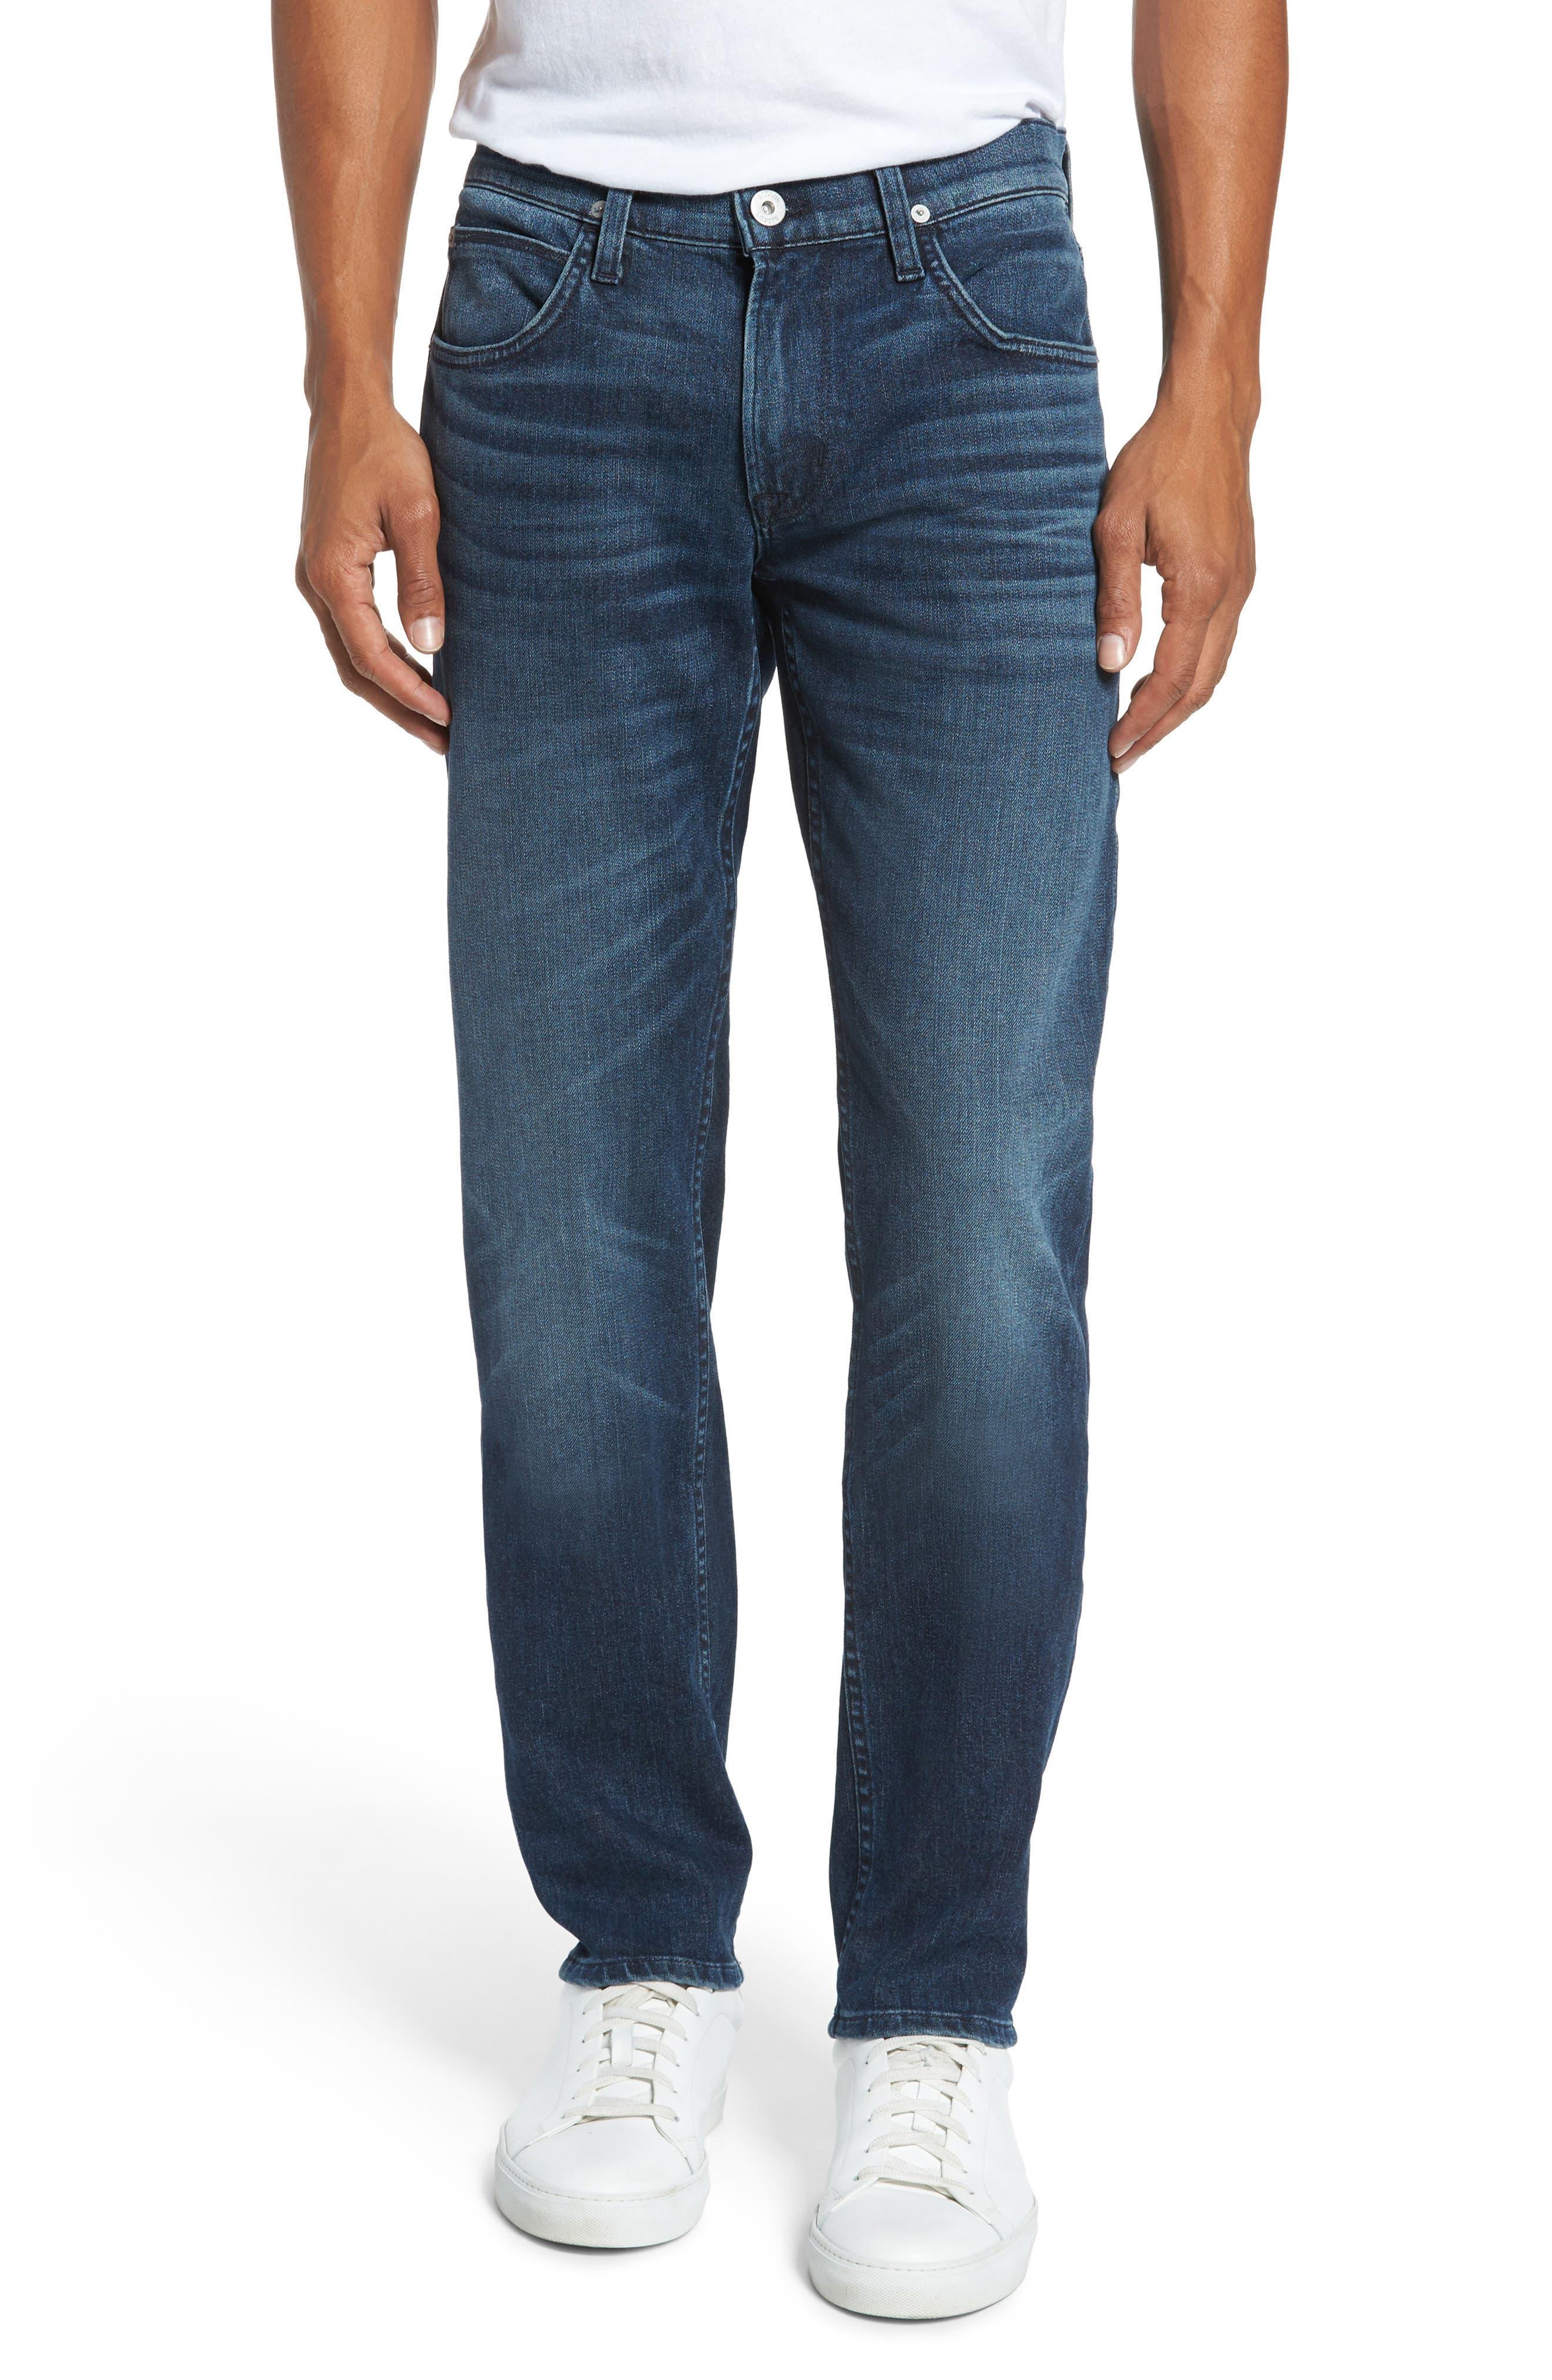 Blake Slim Fit Jeans,                         Main,                         color, Regret